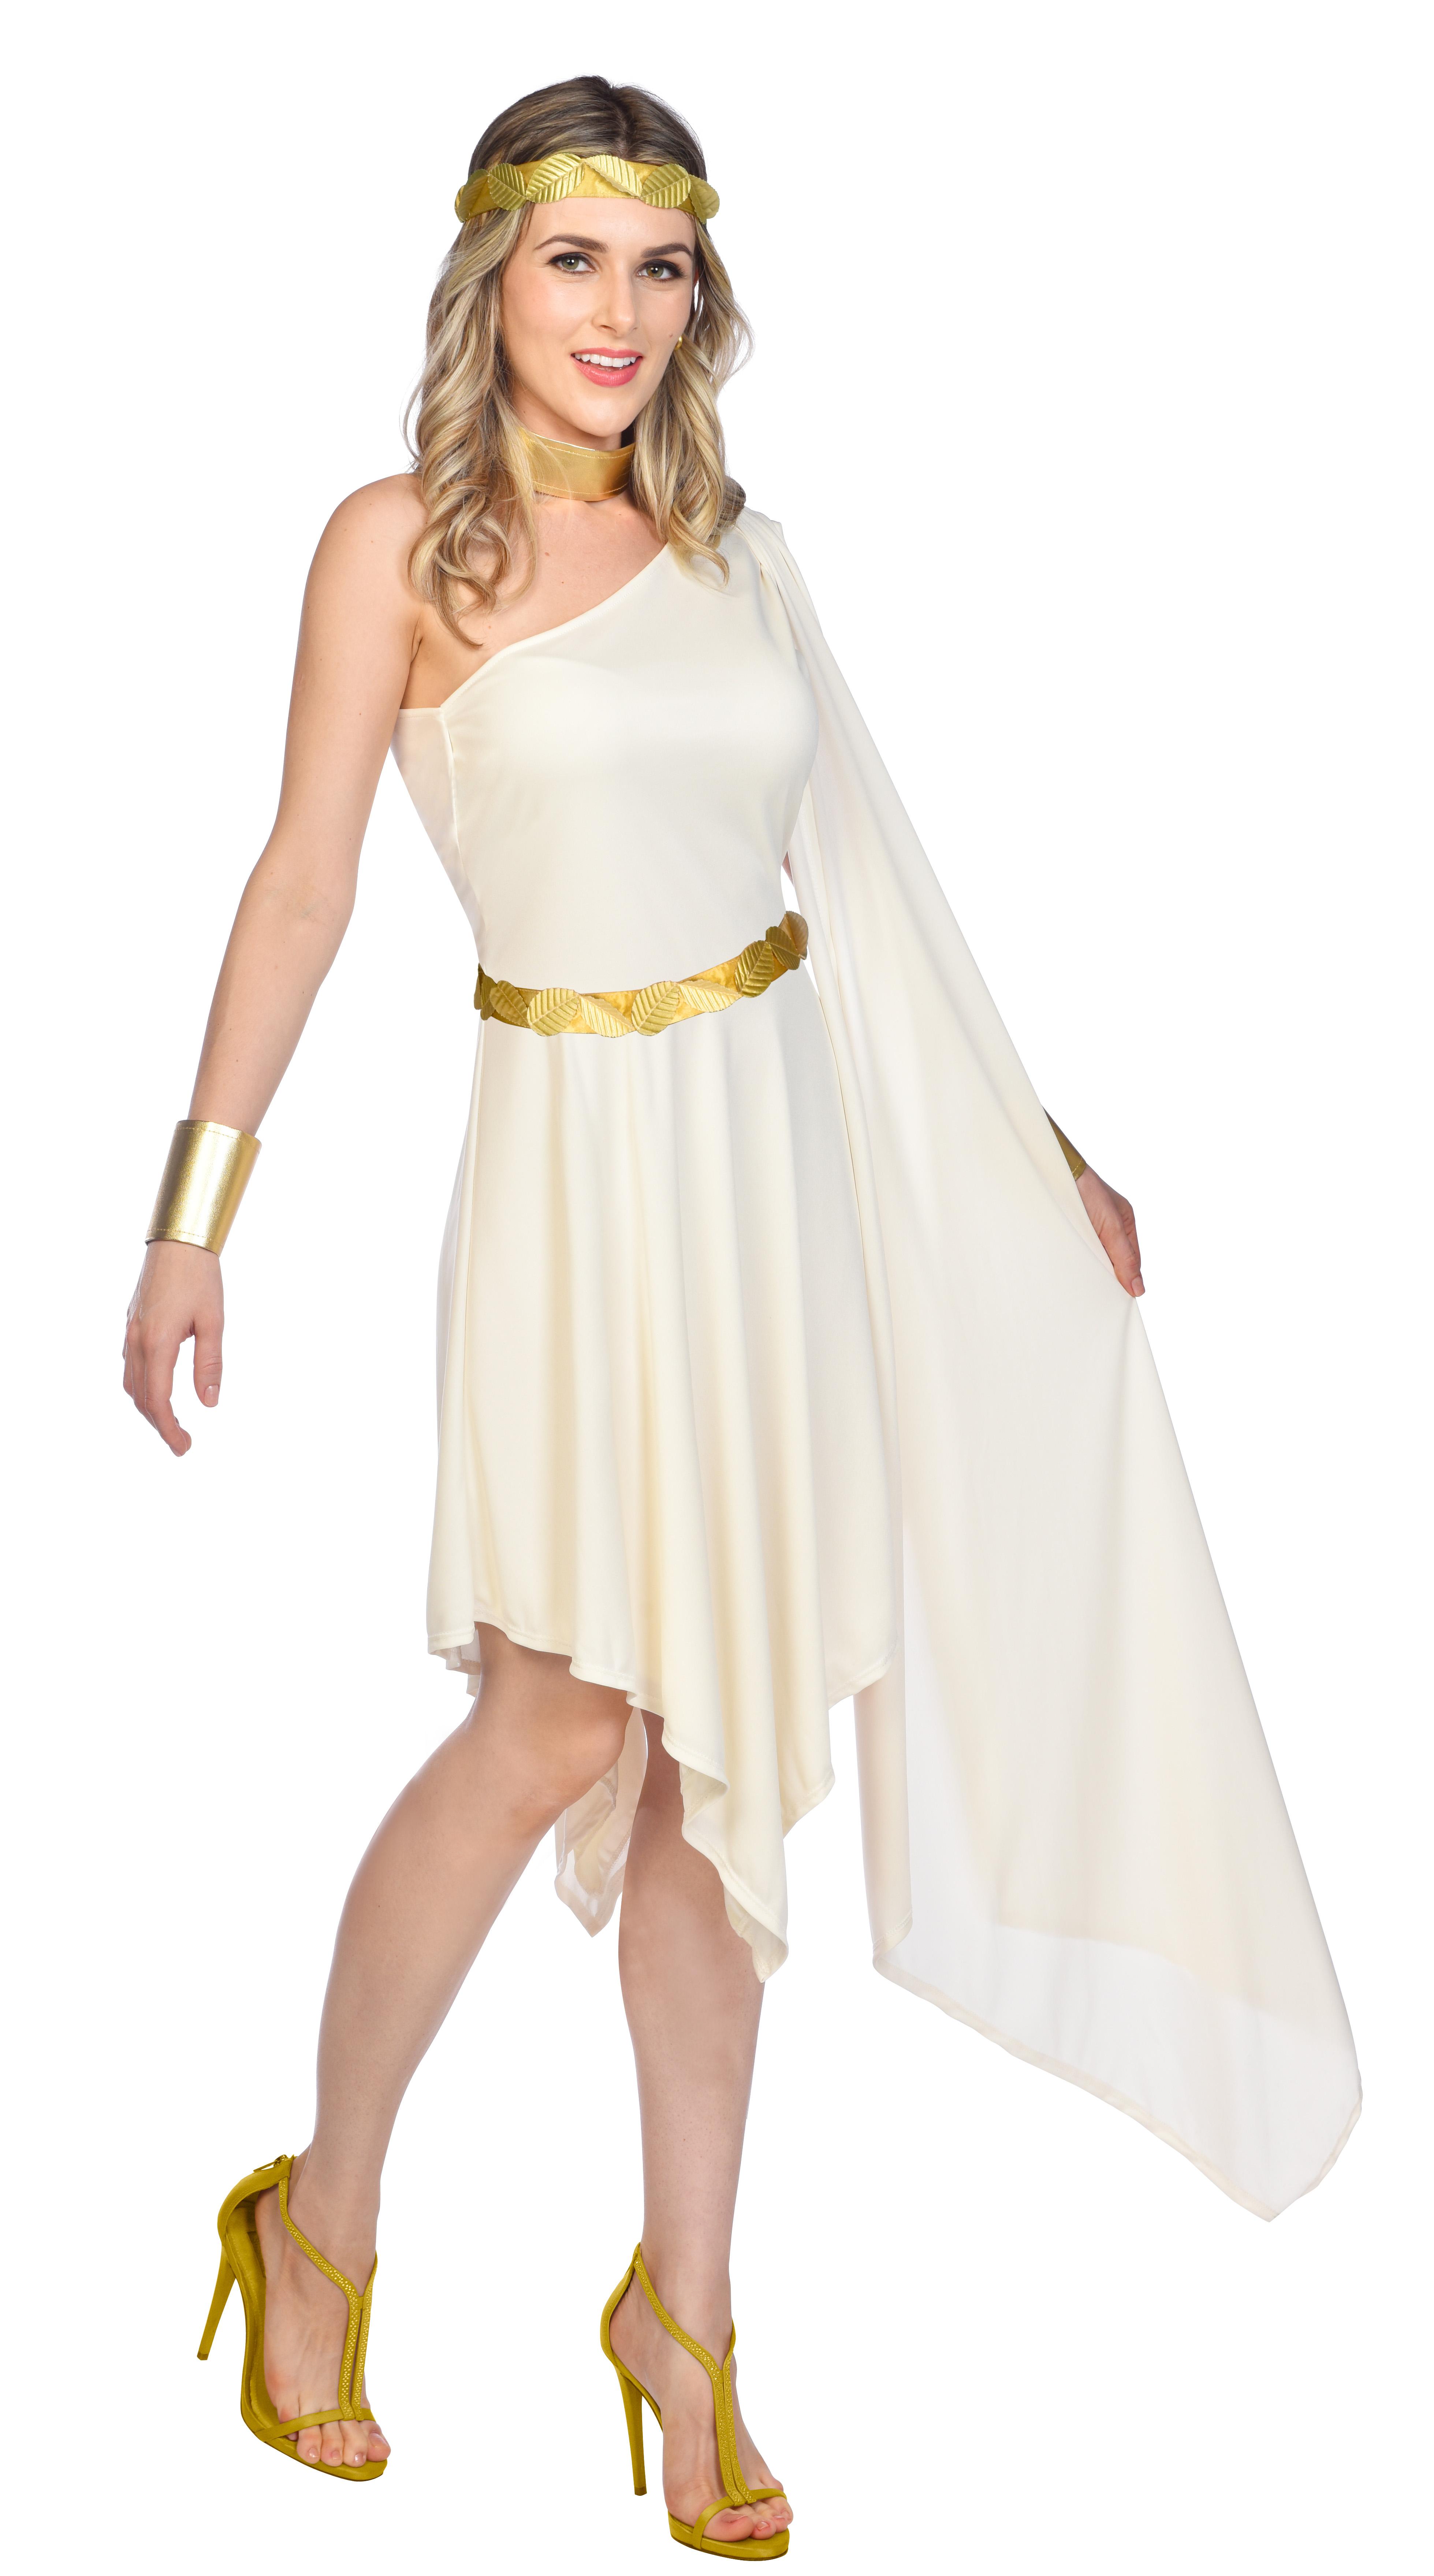 Indexbild 28 - Adult Ladies Golden Goddess Gladiator Greek Roman Toga Fancy Dress Costume New